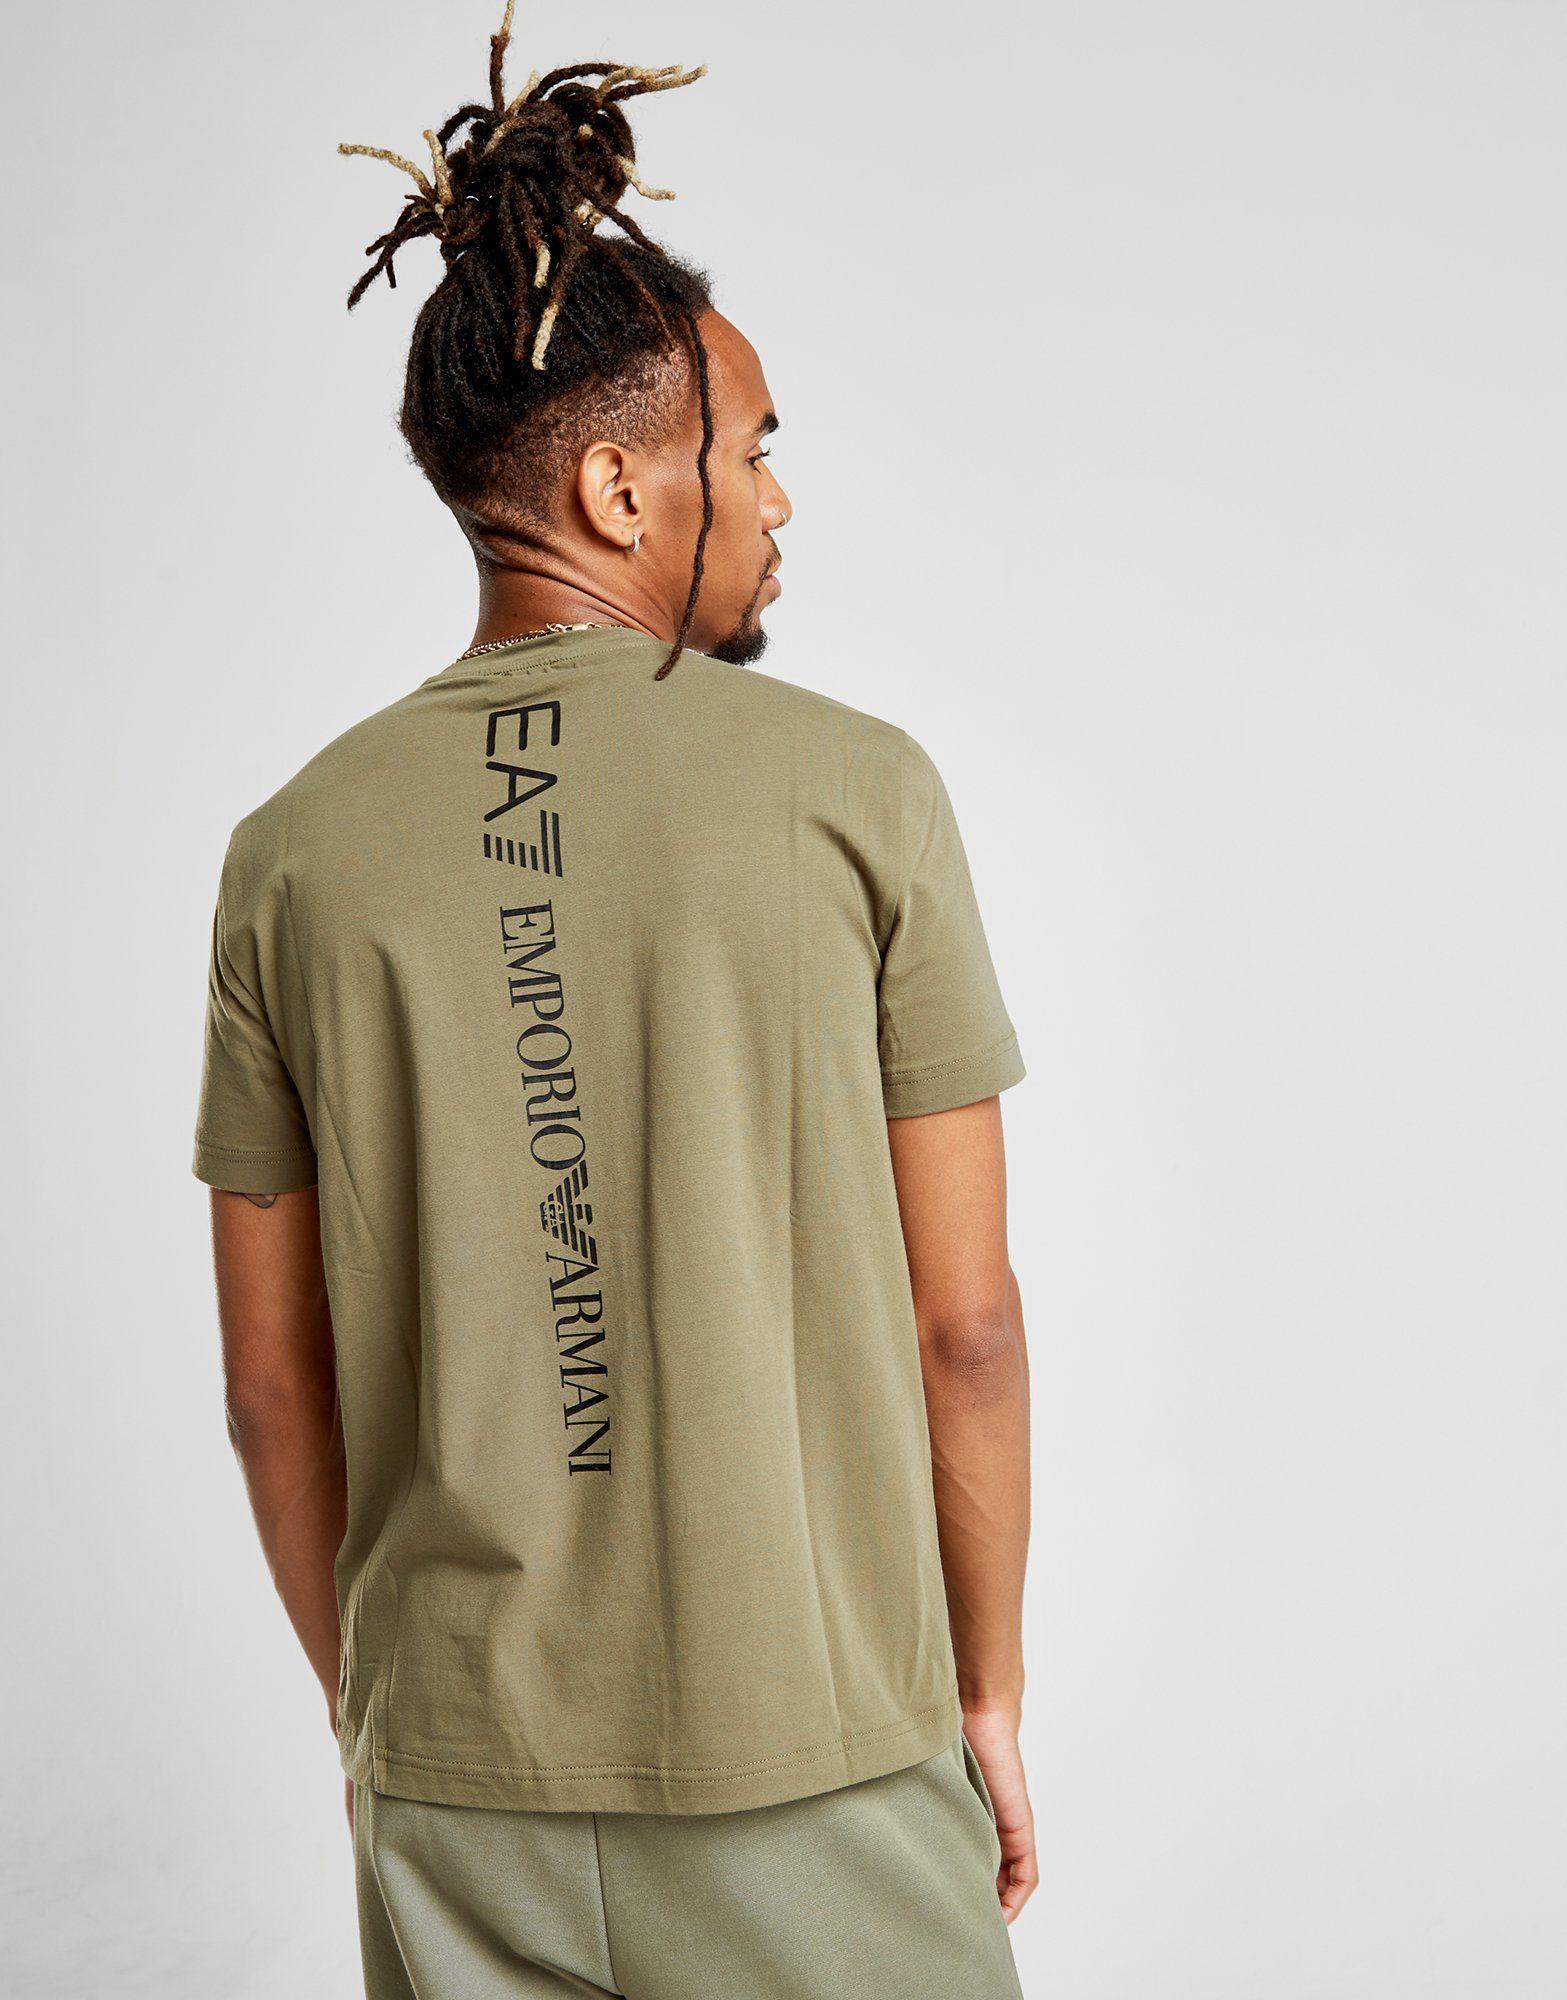 Emporio Armani EA7 Back Vertical Logo T-Shirt Gr眉n